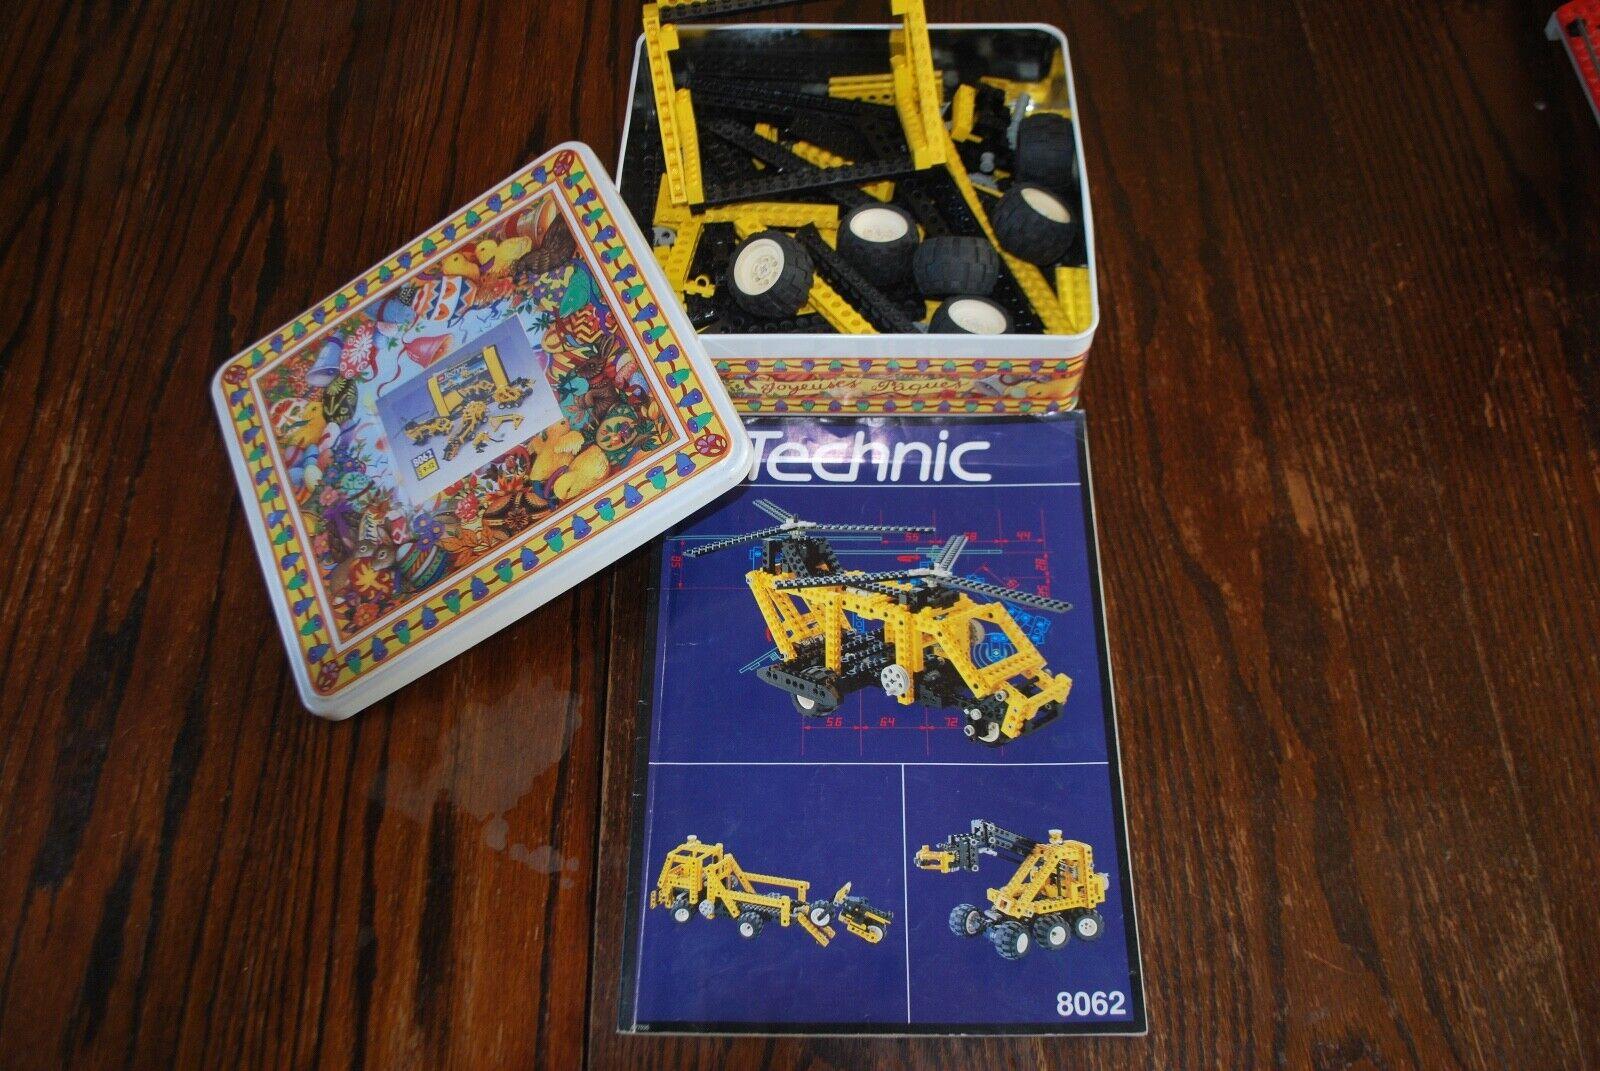 LEGO Technic 8062 complet avec manuel